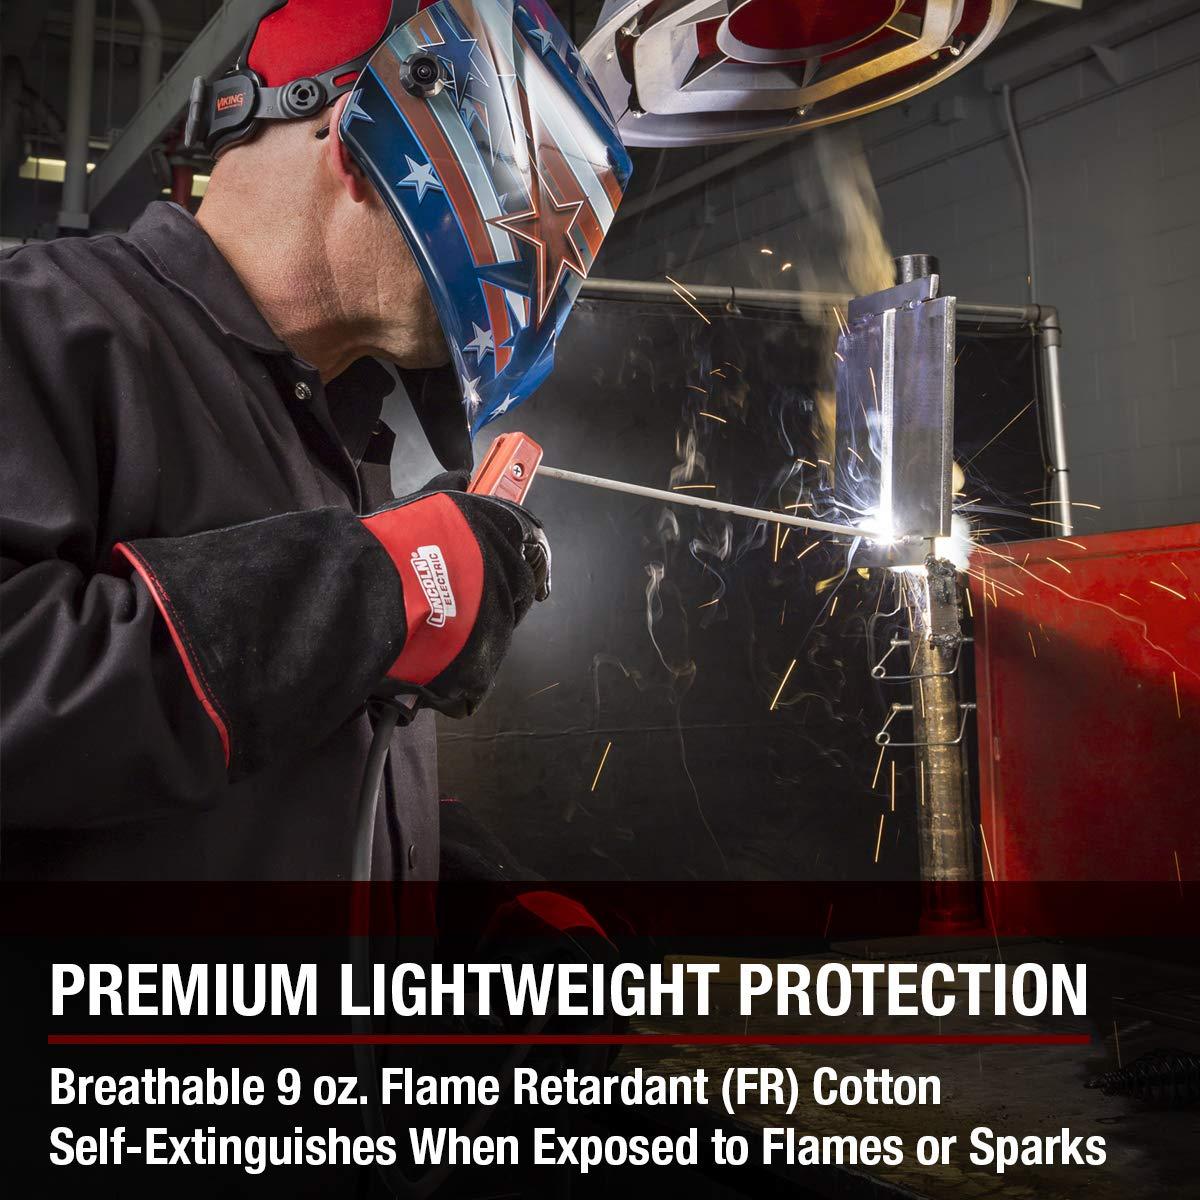 Lincoln Electric  Premium Flame Resistant (FR) Cotton Welding Jacket | Comfortable | Black | XXXL | K2985-XXXL by Lincoln Electric (Image #4)